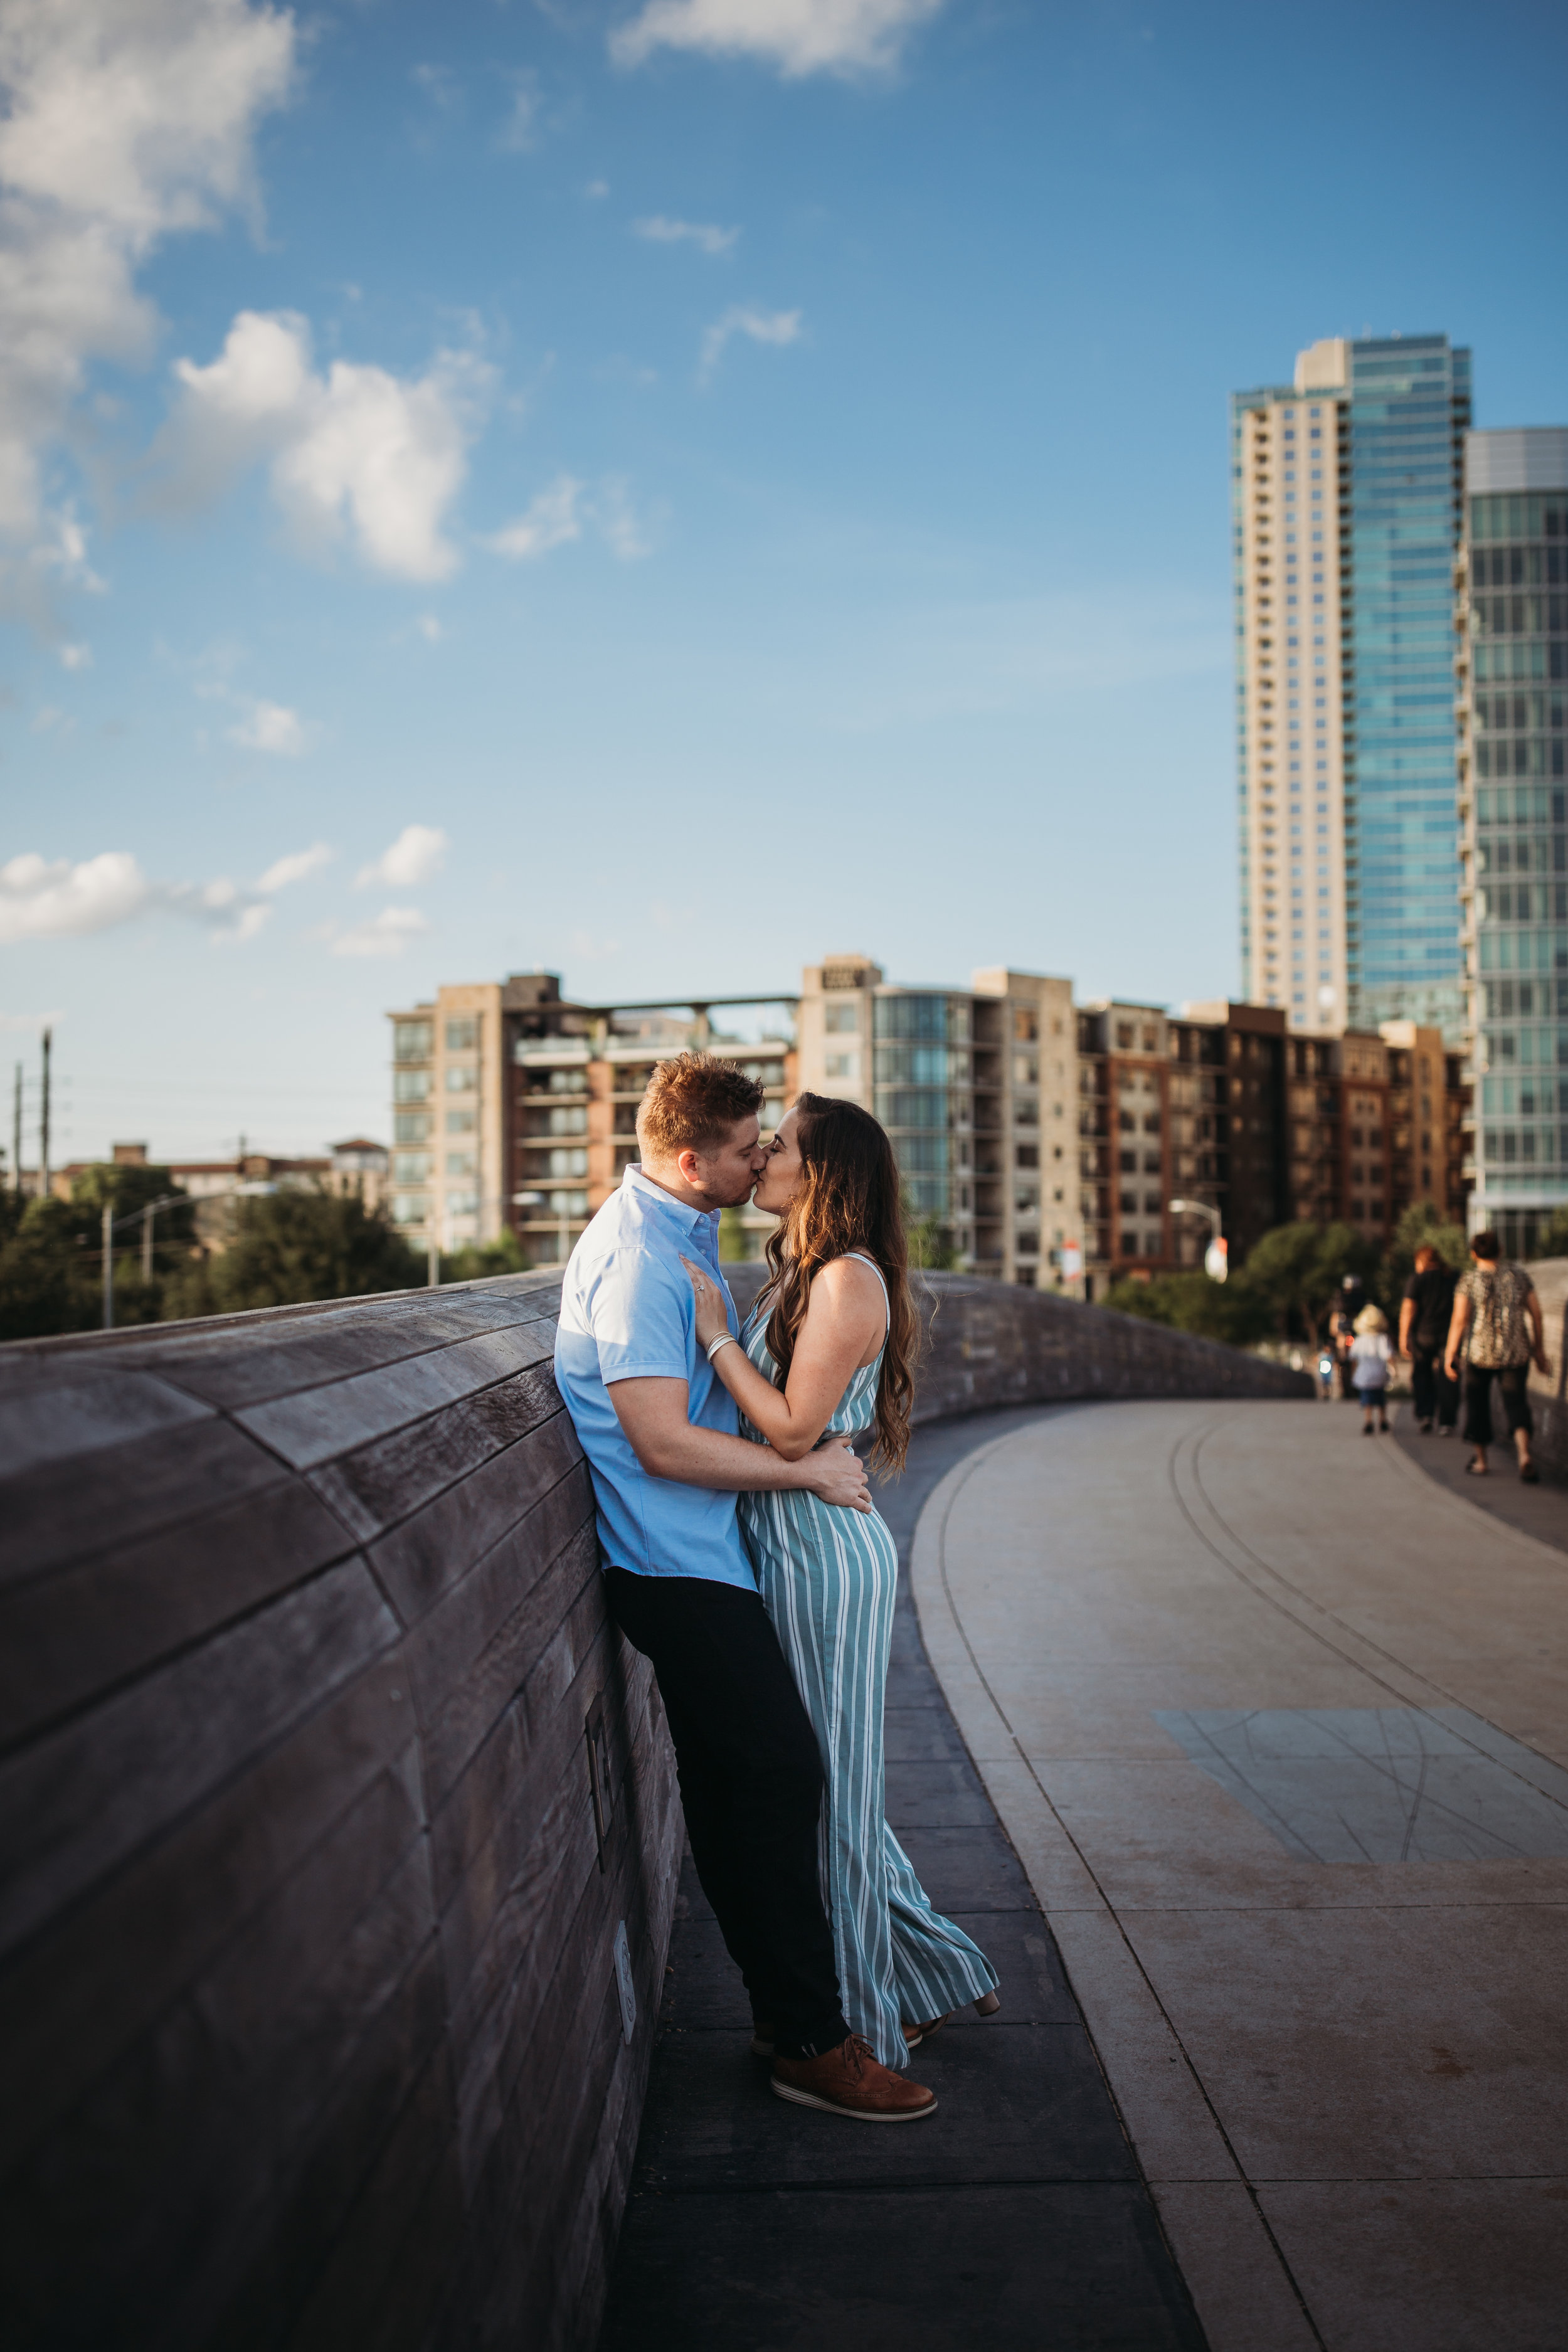 austin-engagement-heatherwise-downtown